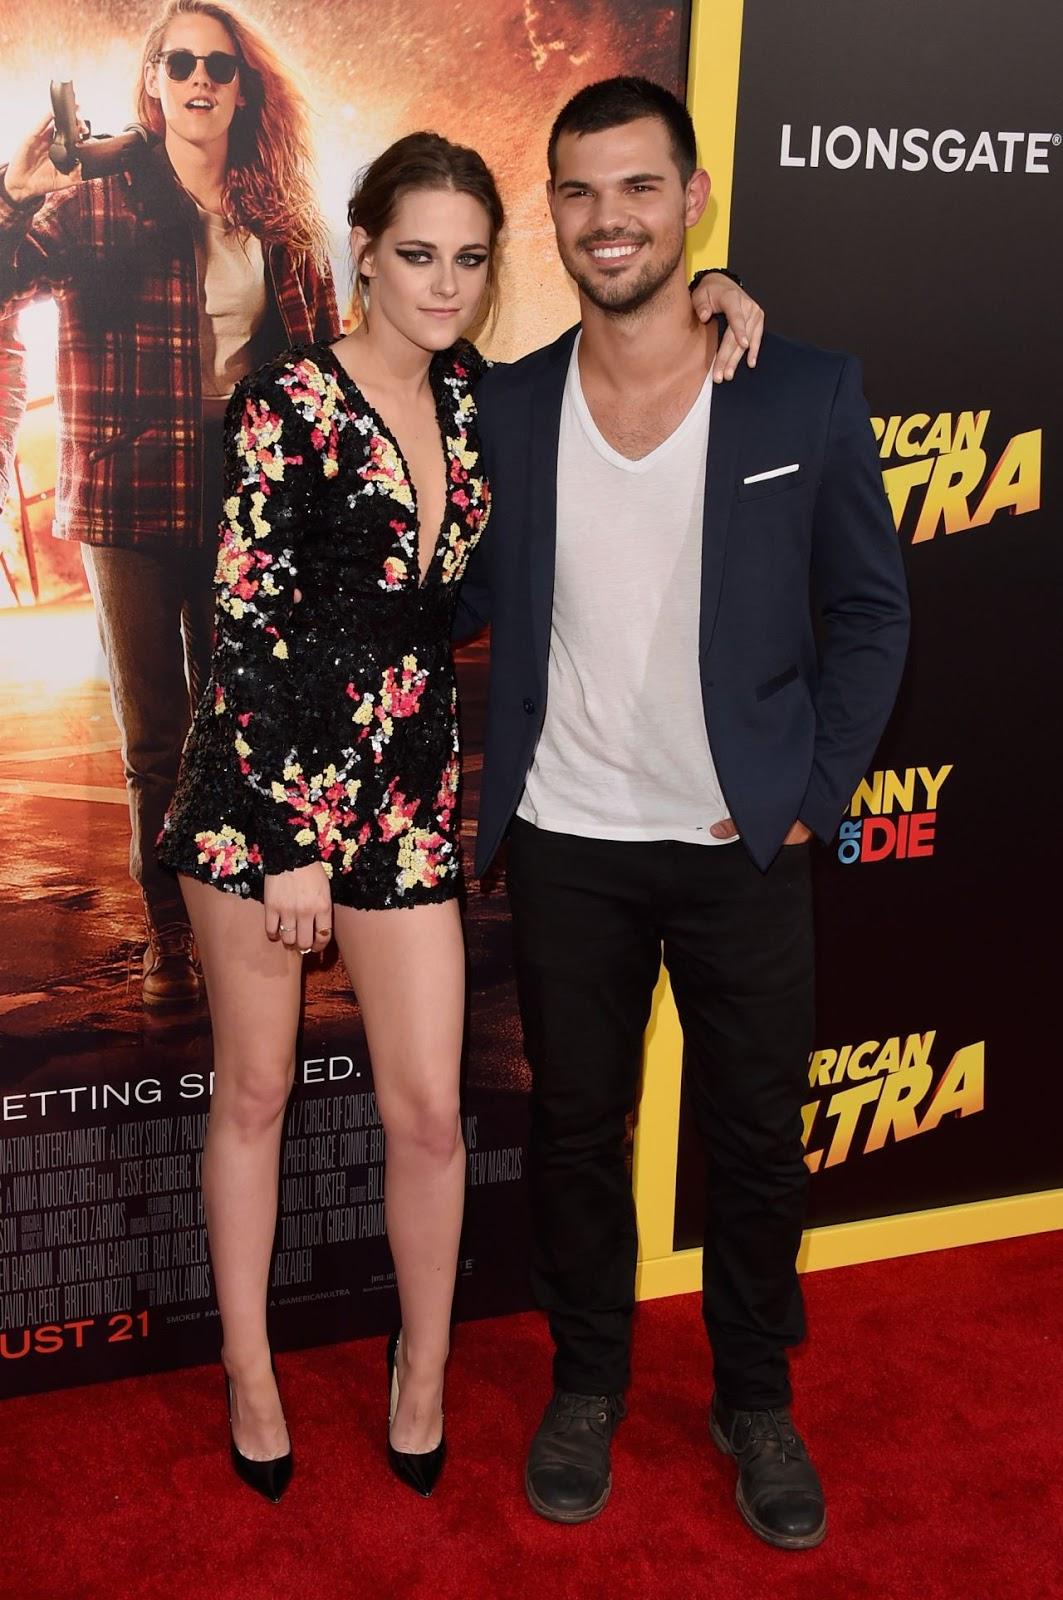 Taylor Lautner joins Kristen Stewart at her 'American Ultra' premiere in Los Angeles